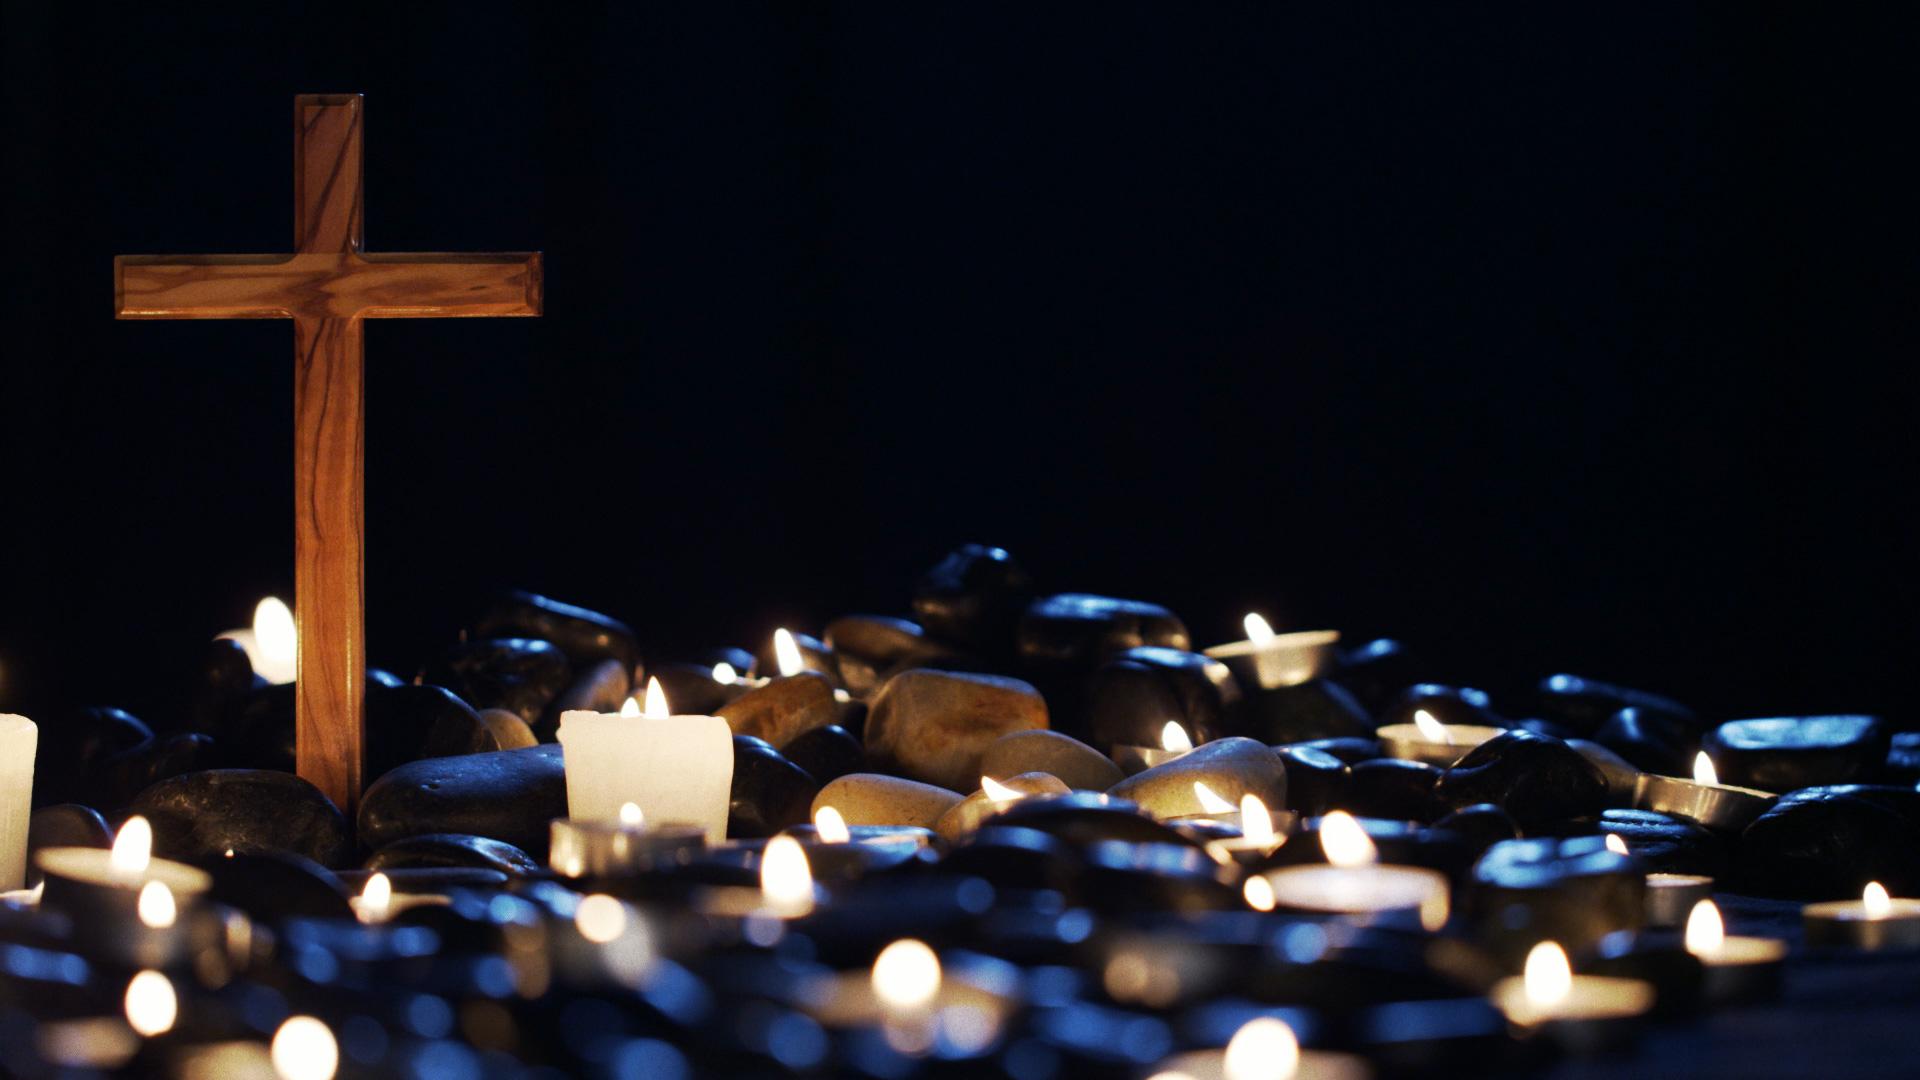 CandlesRocks-02.jpg